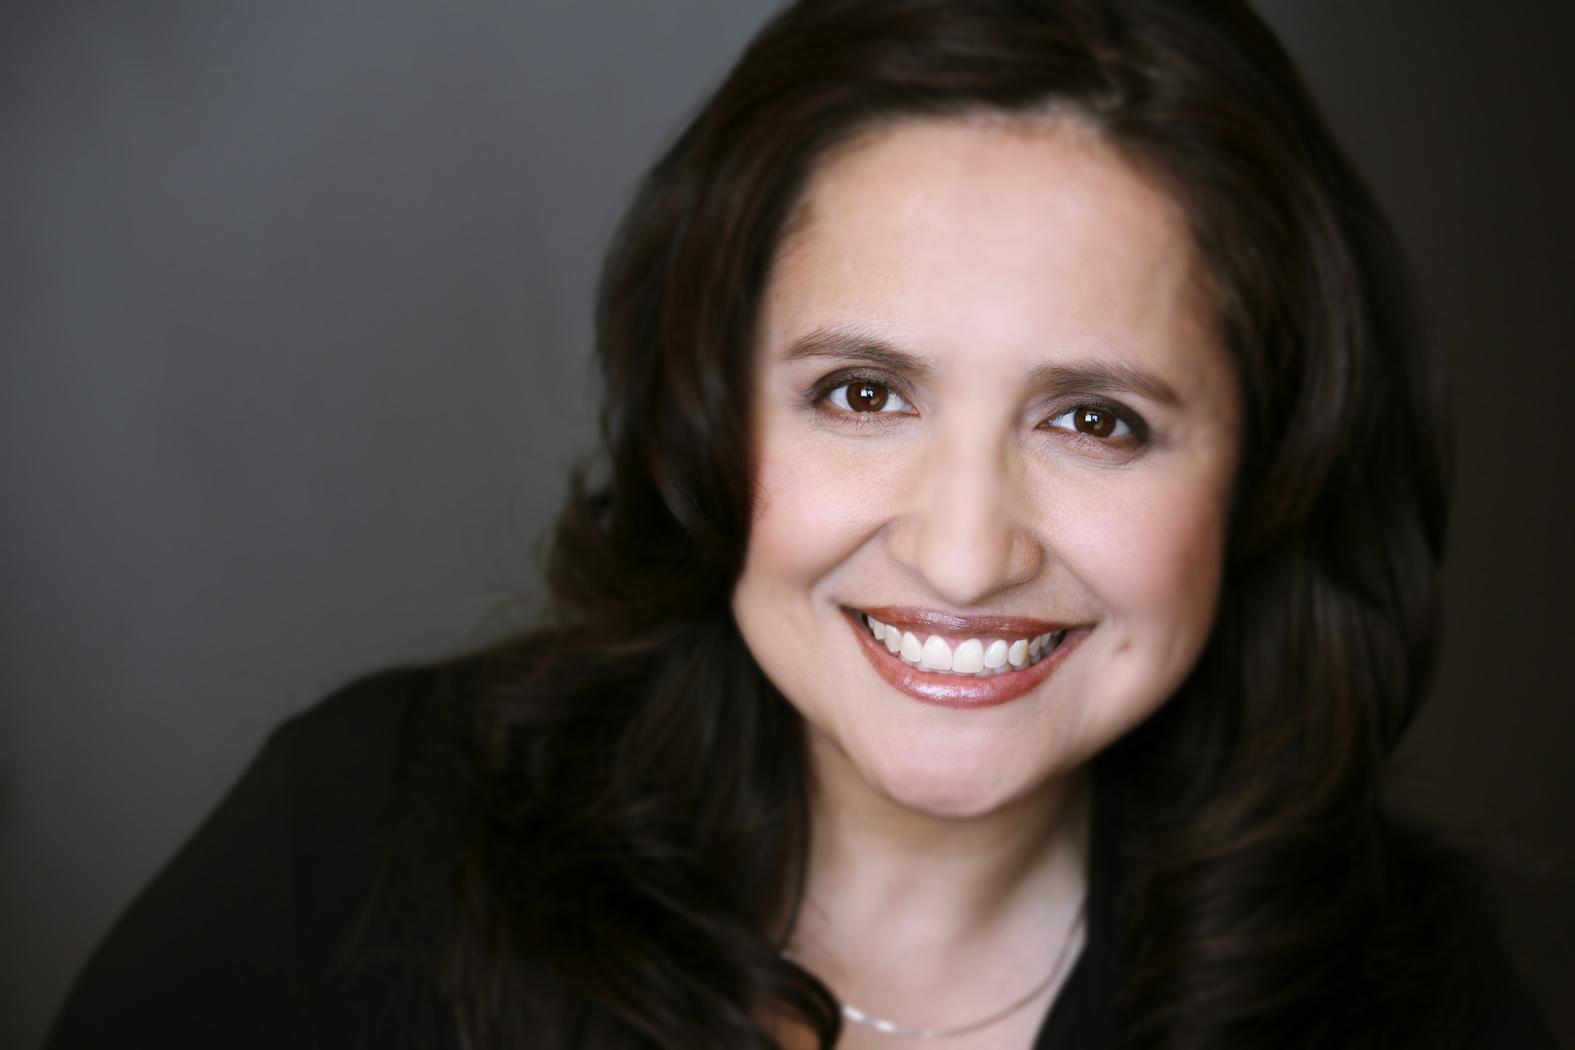 Carla Ivette Yashiro